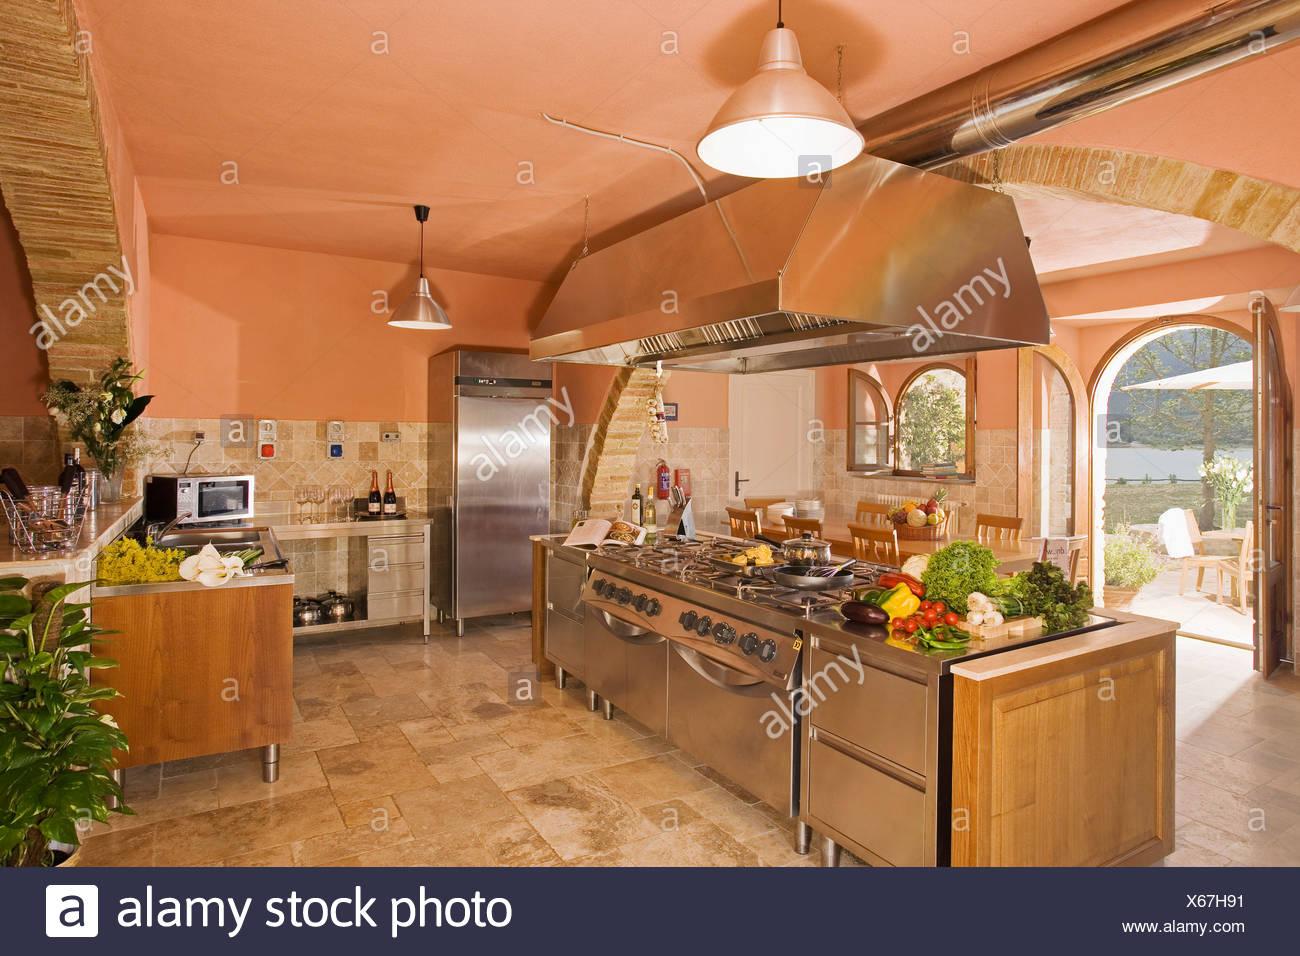 Country Interiors Kitchens Stockfotos & Country Interiors Kitchens ...